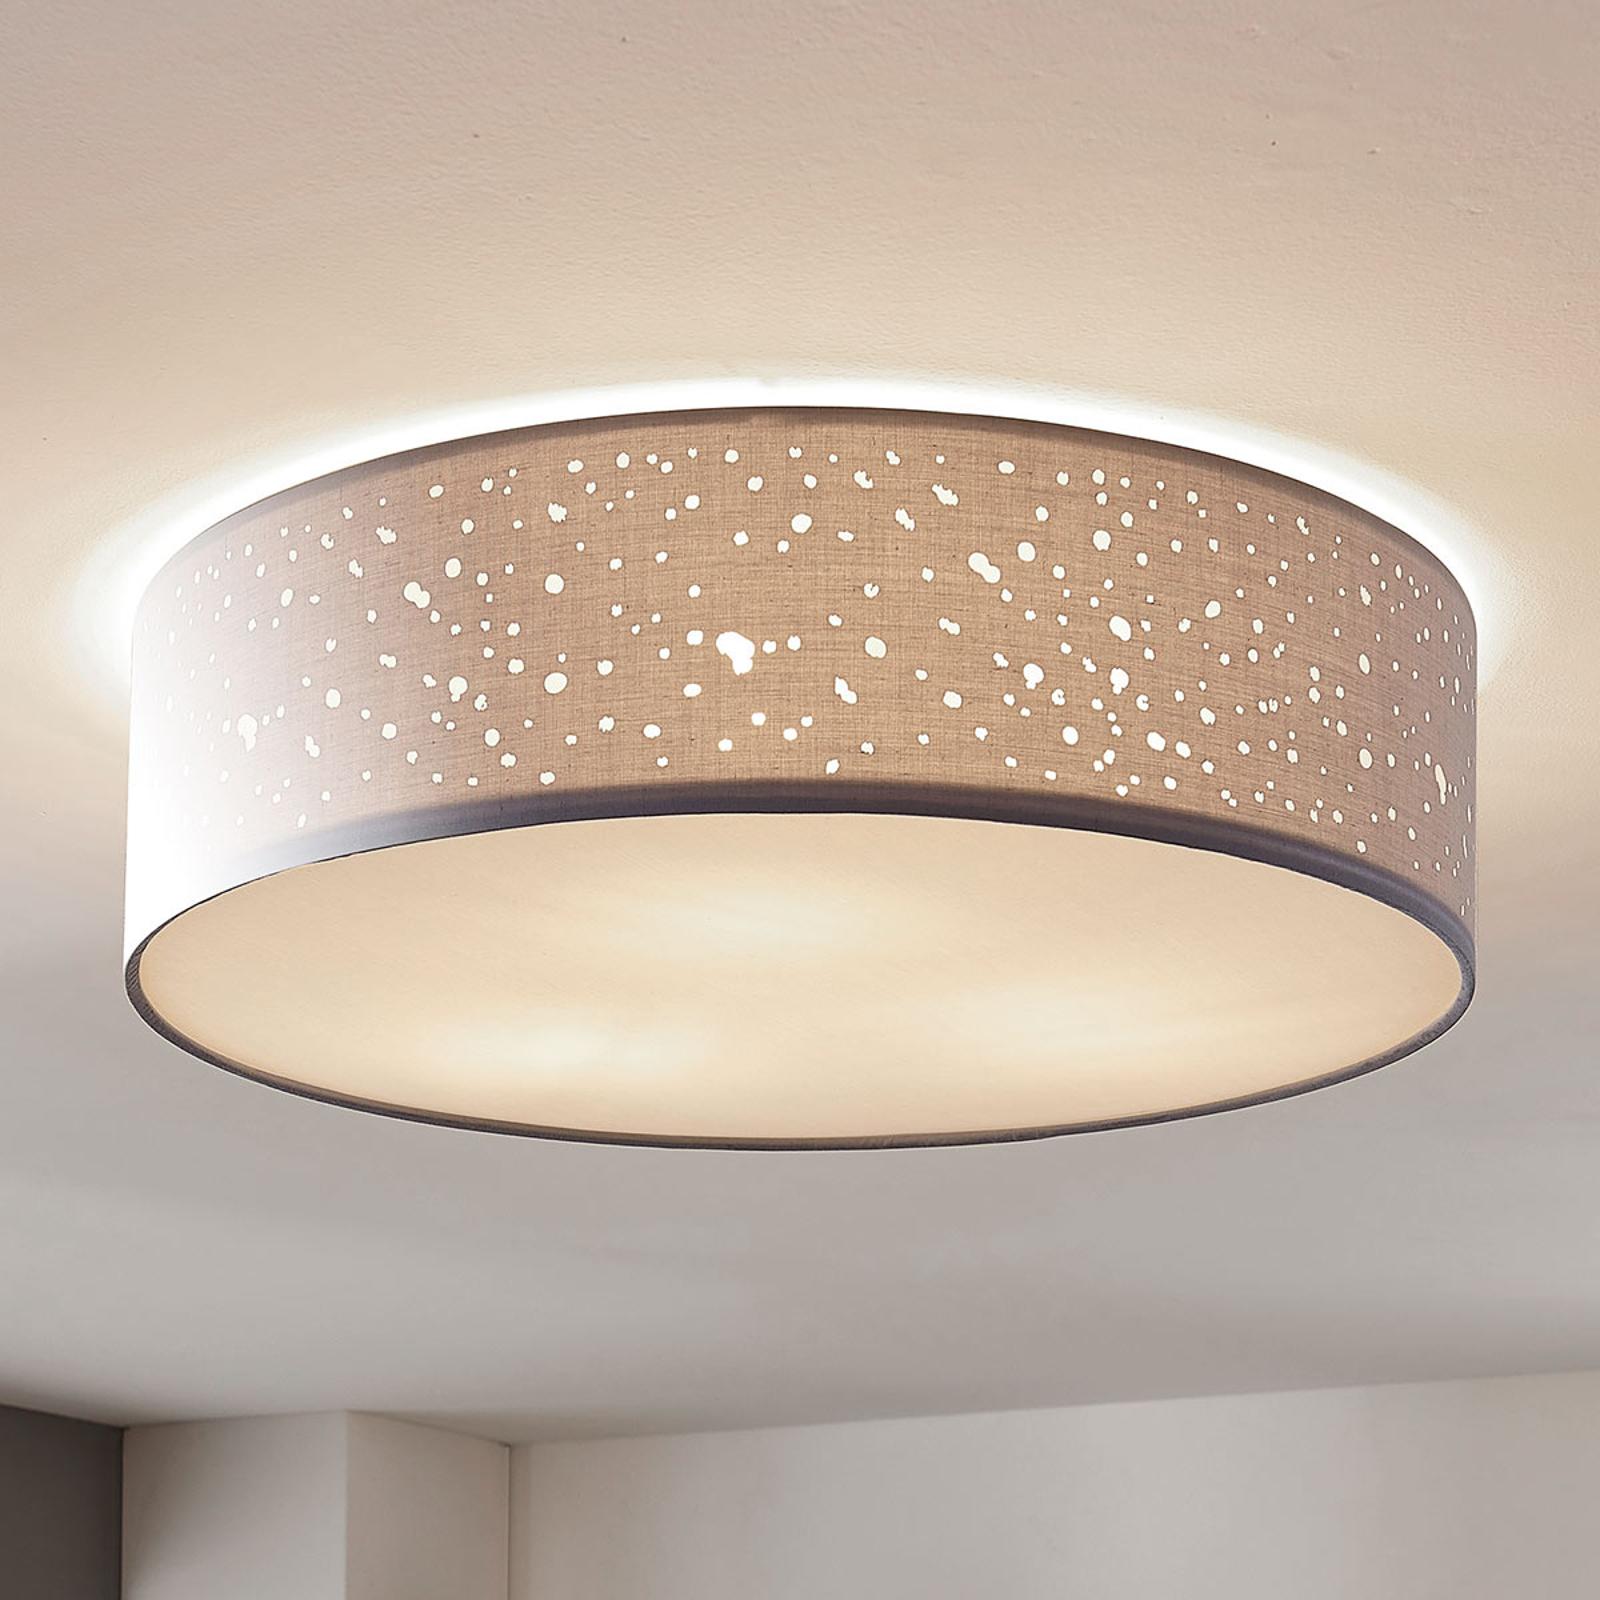 Plafondlamp Umma, direct aan het plafond, grijs